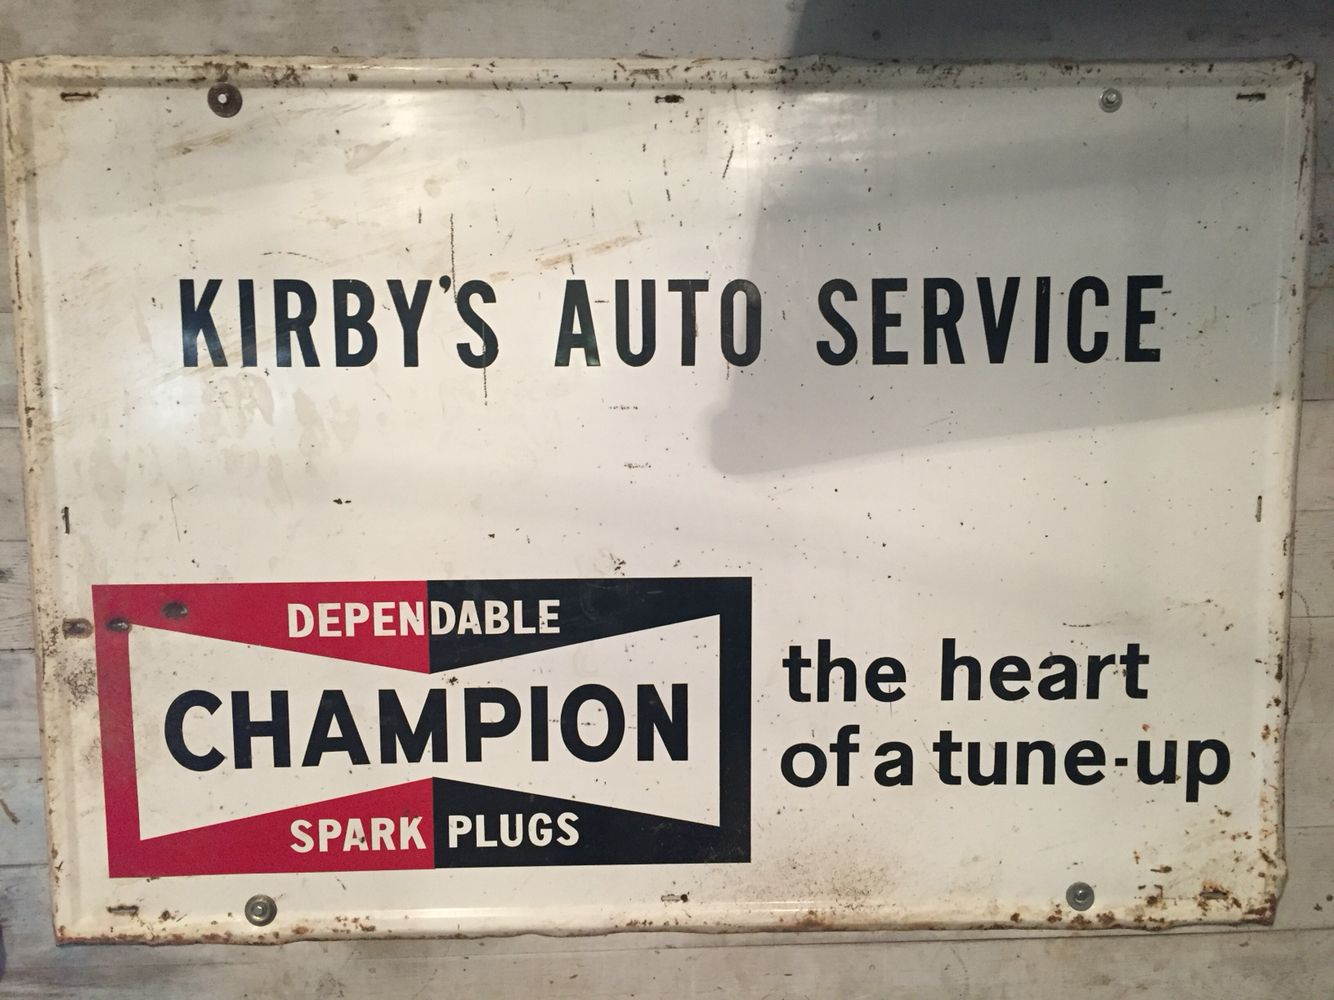 Kirby's Esso Auto service, Spark plug, Kirby